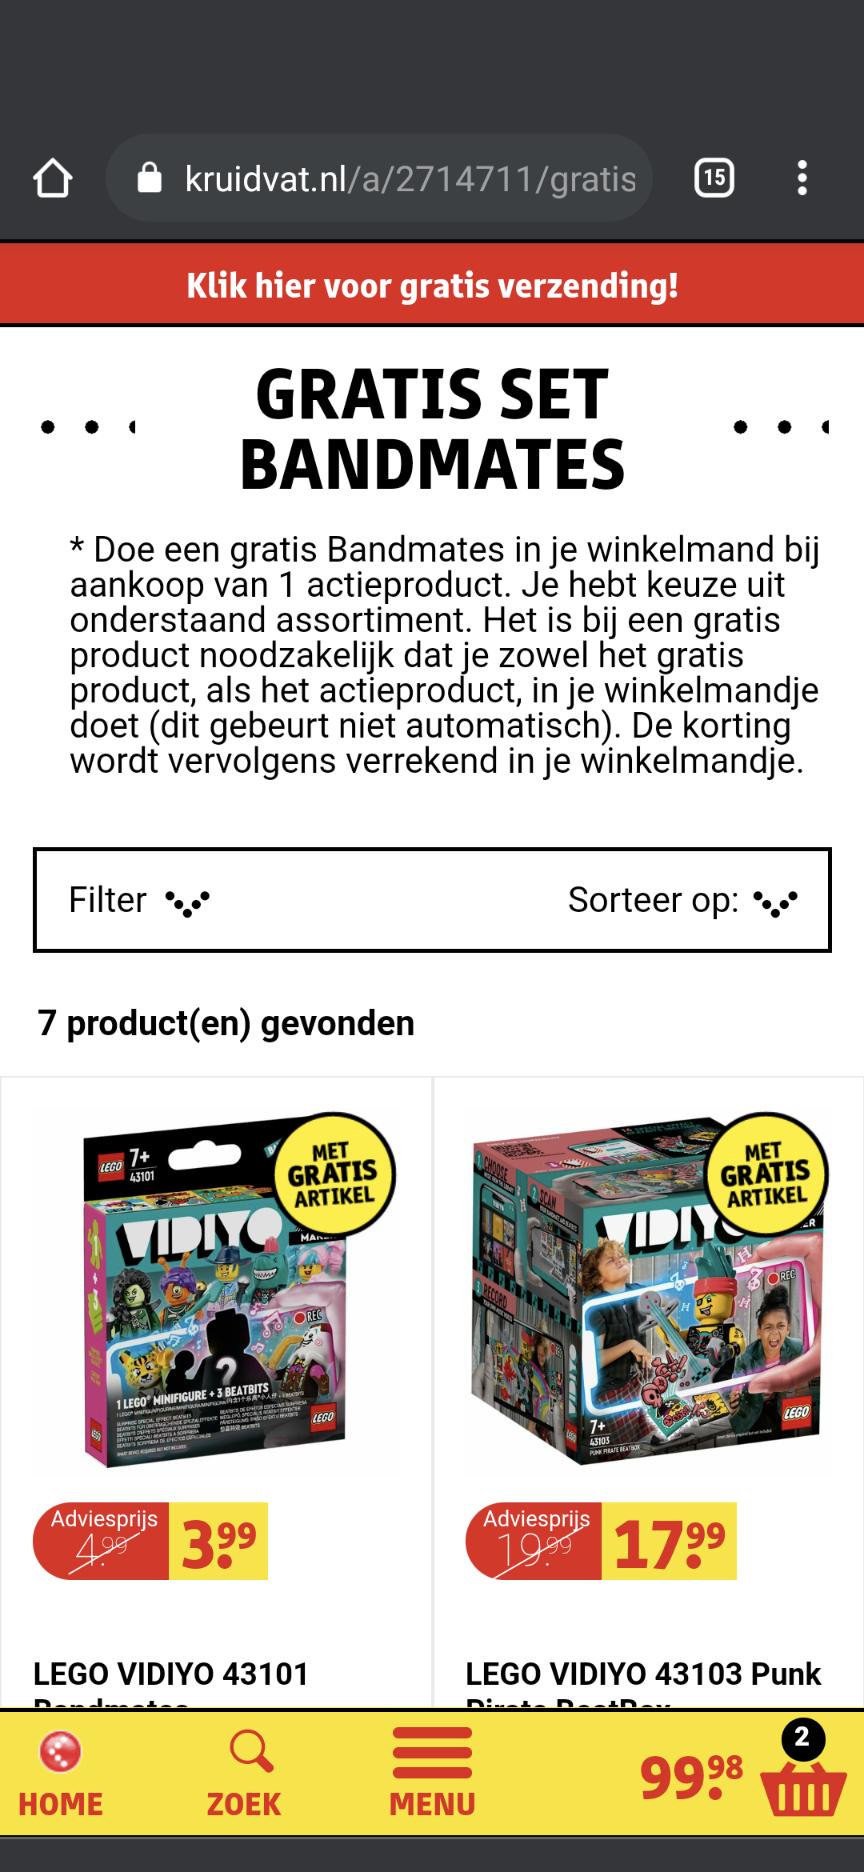 Gratis Lego Vidiyo bandmate bij aankoop van Vidiyo Beatbox